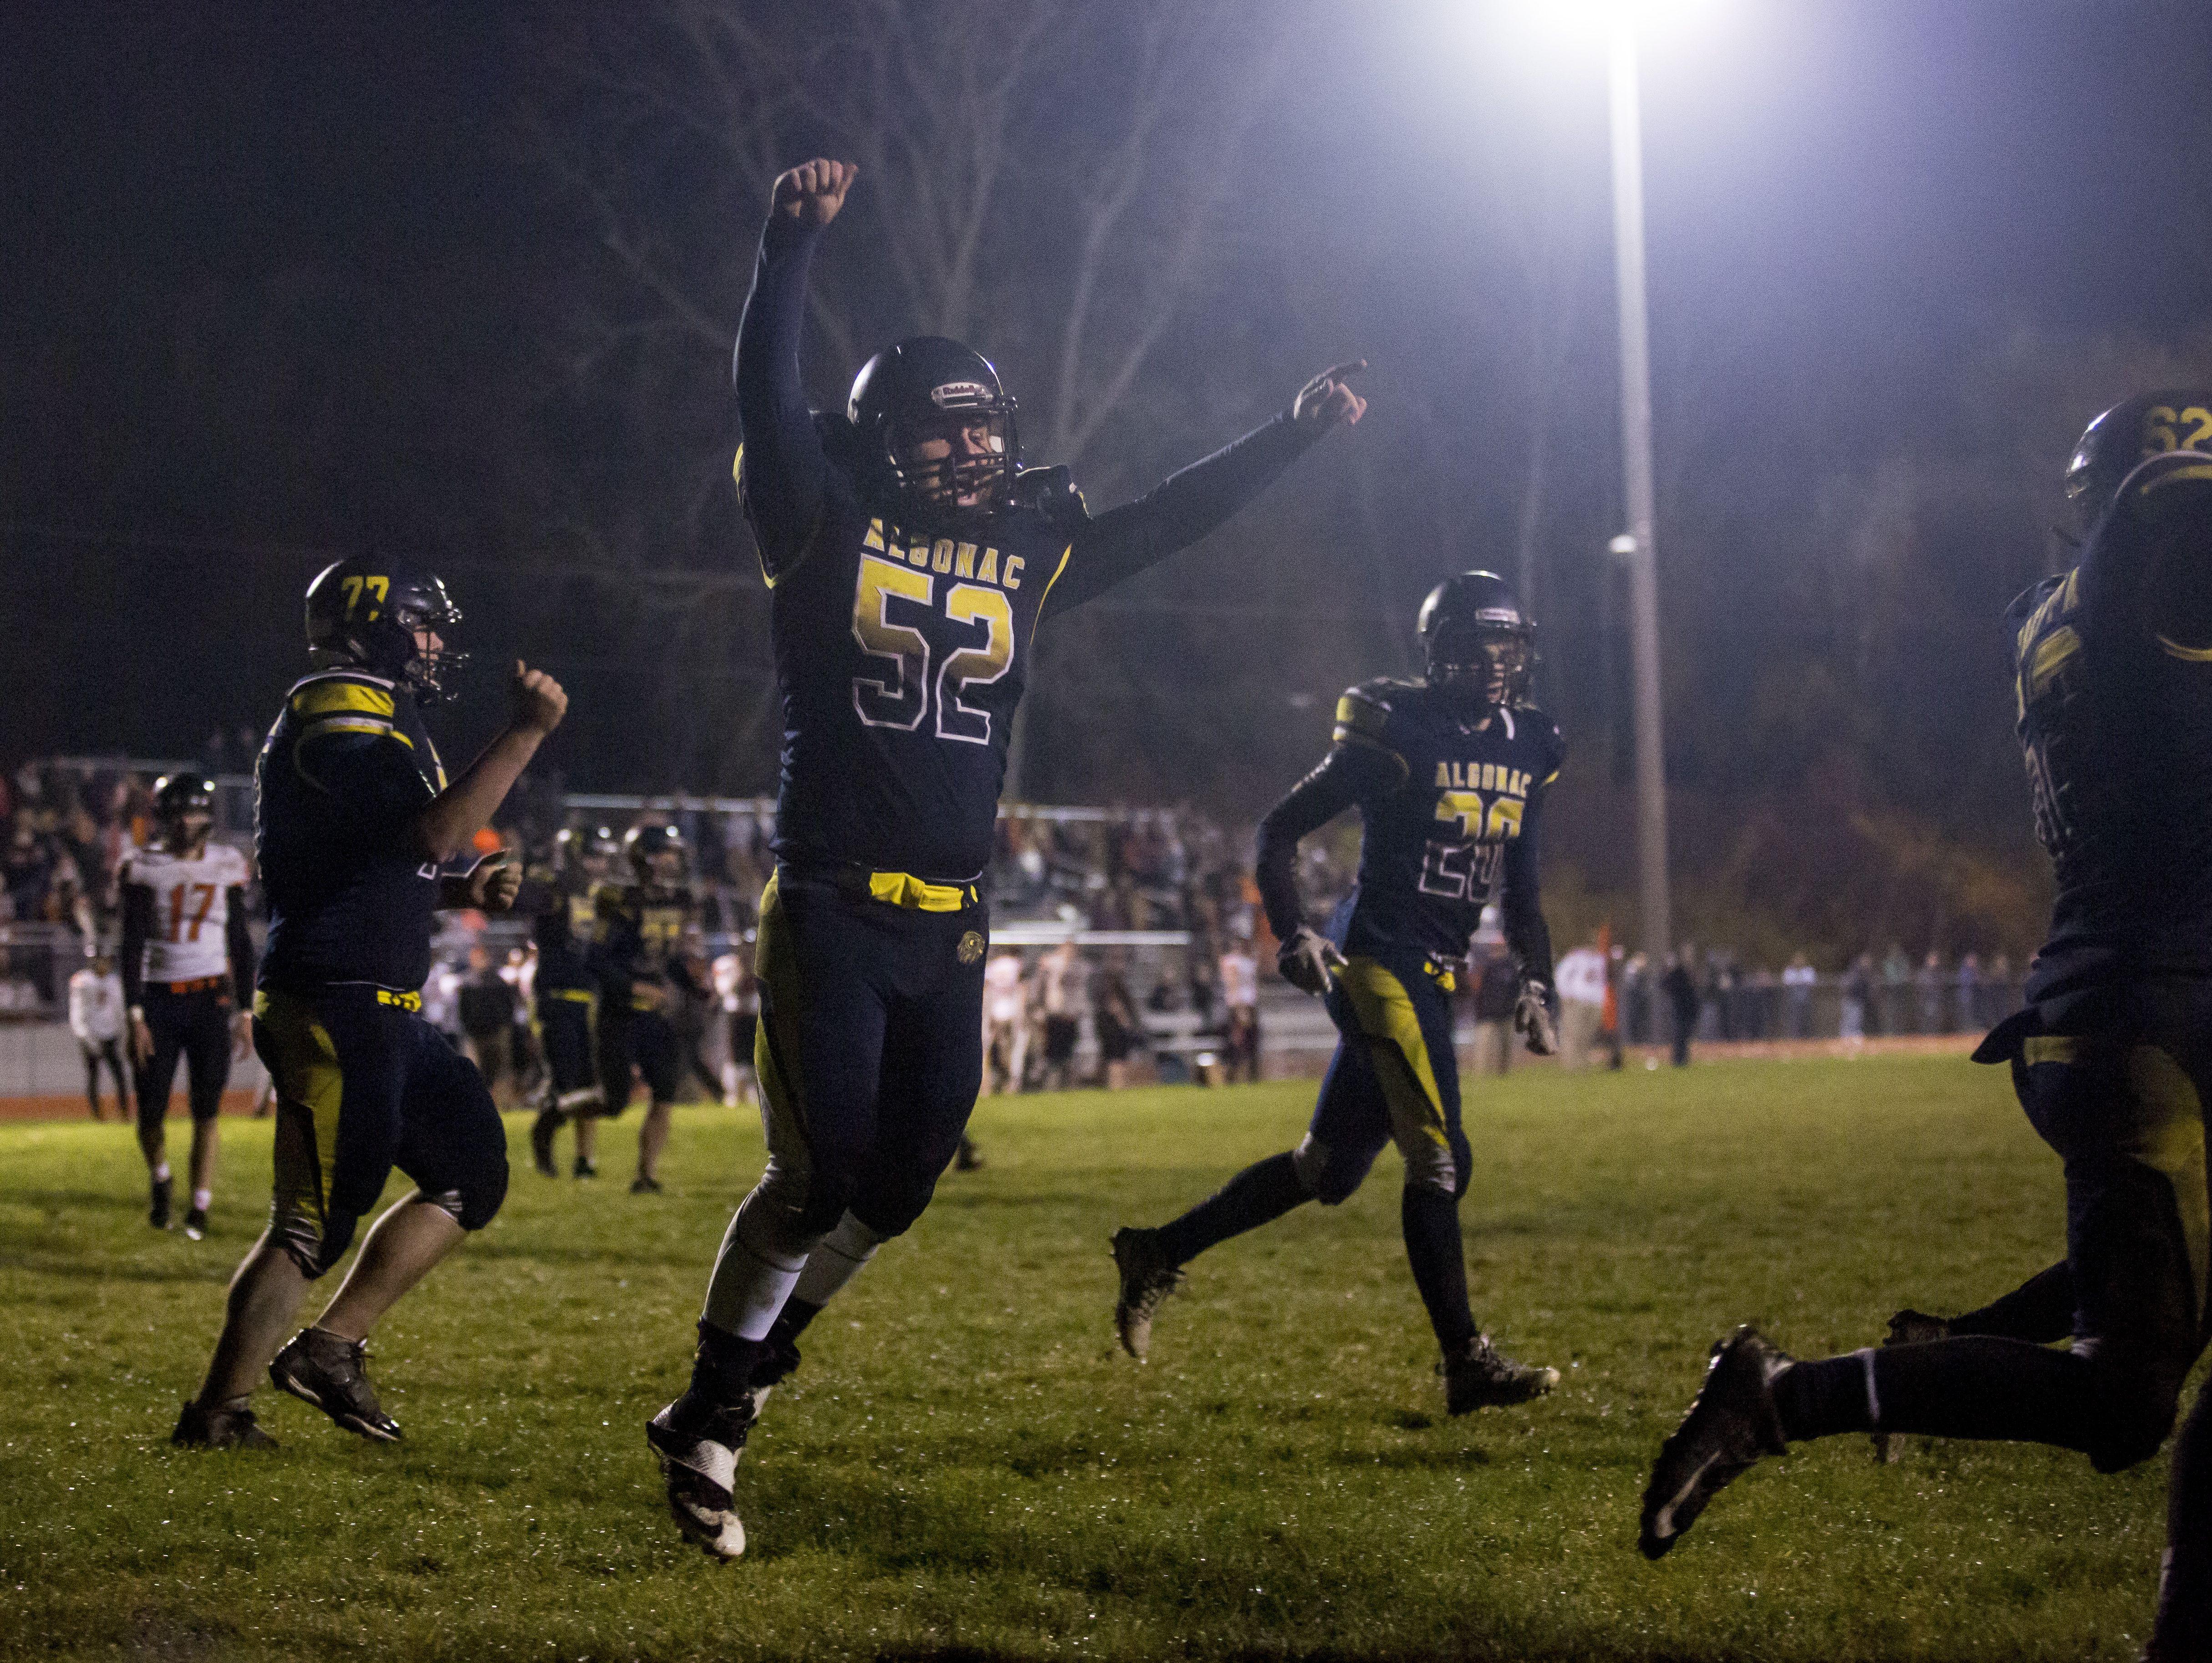 Algonac's Donovan Huber celebrates during a football game Friday, Nov. 4, 2016 at Algonac High School.